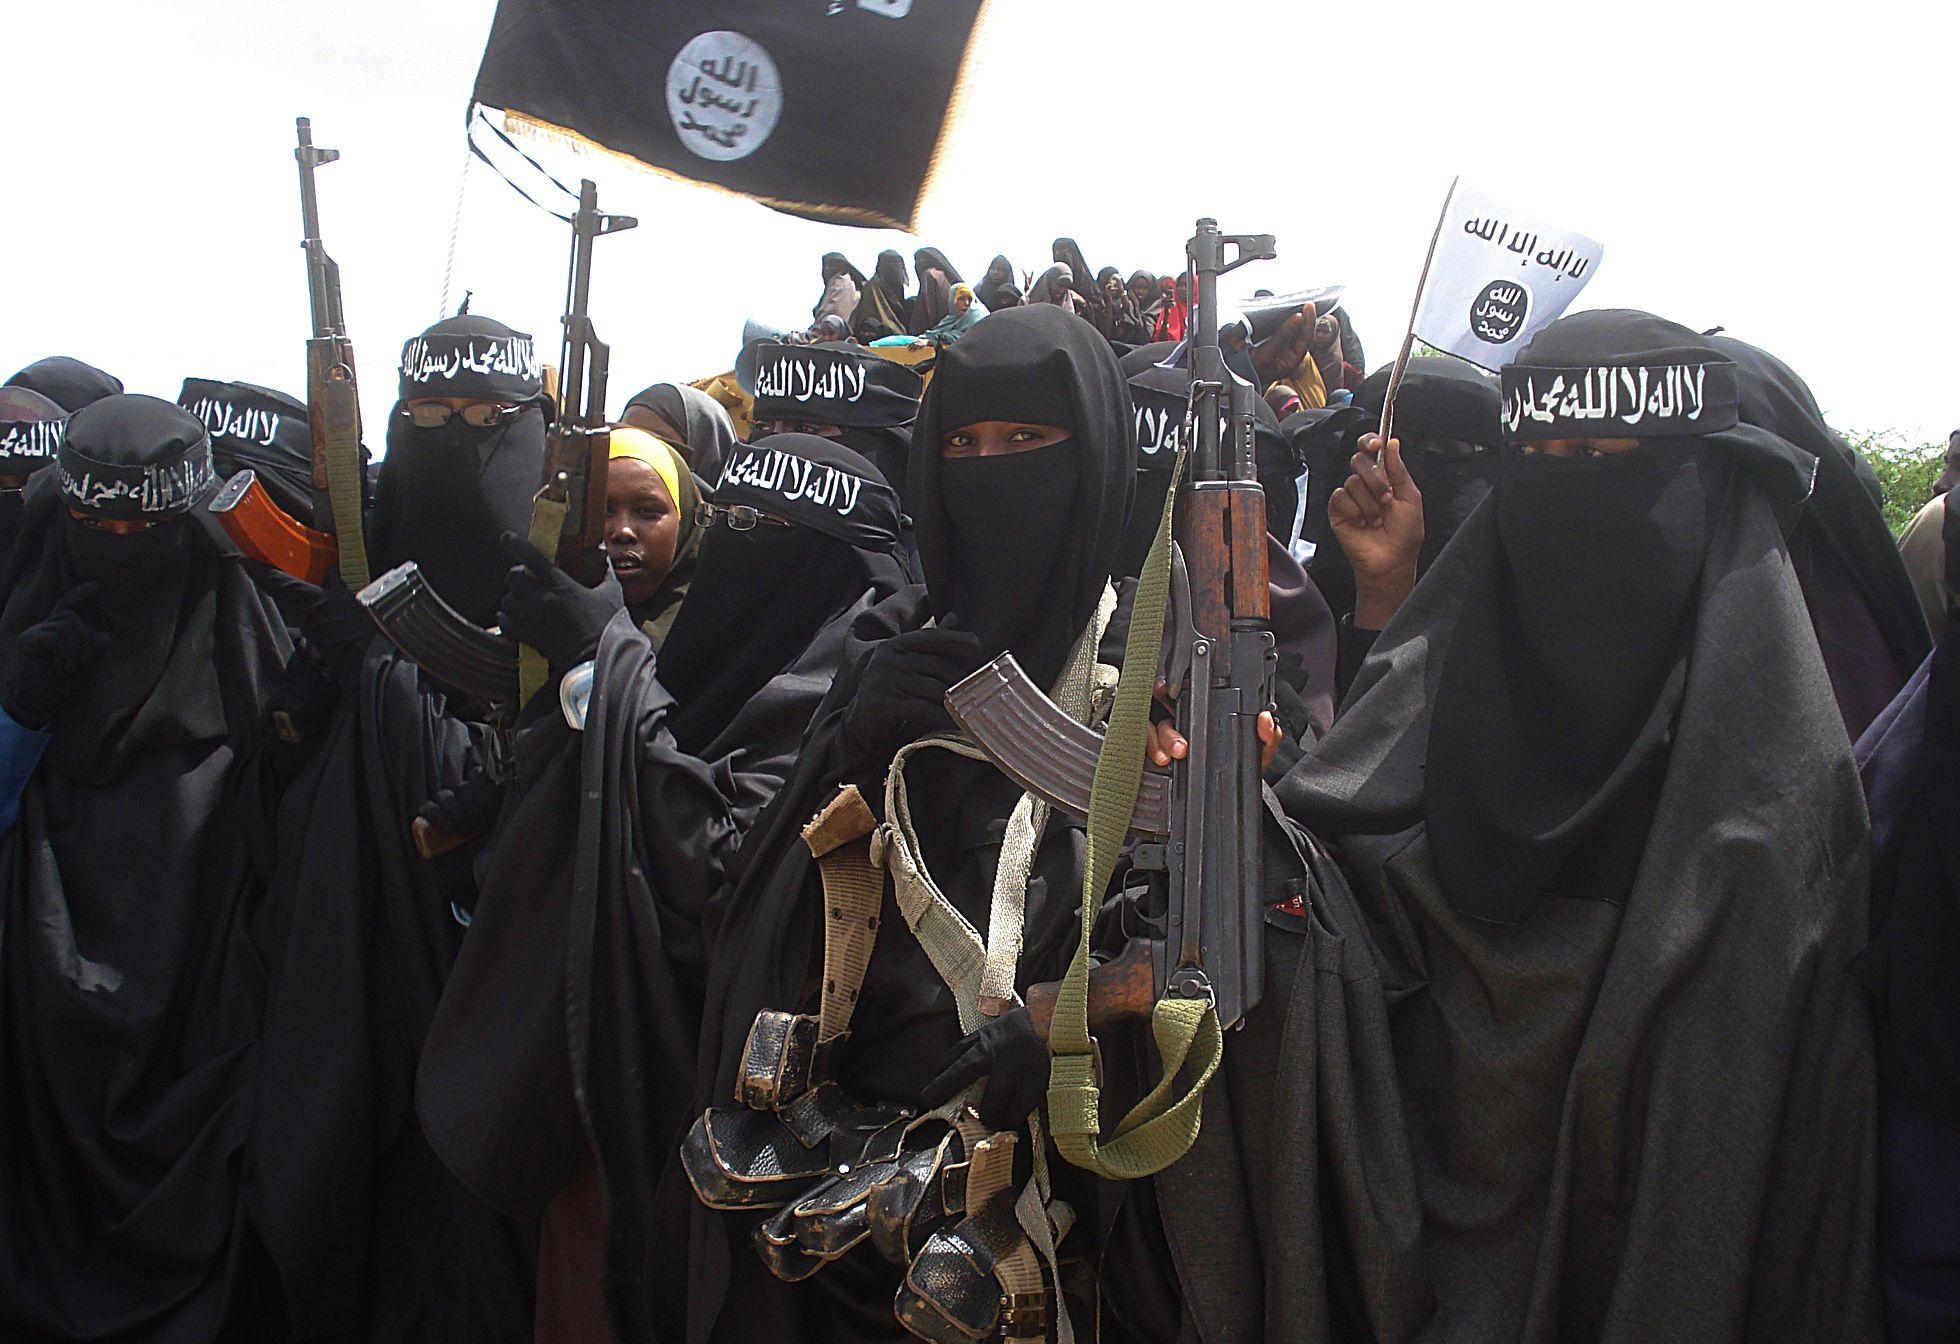 Somali women participate in an Al-Shabab demonstration in Mogadishu.